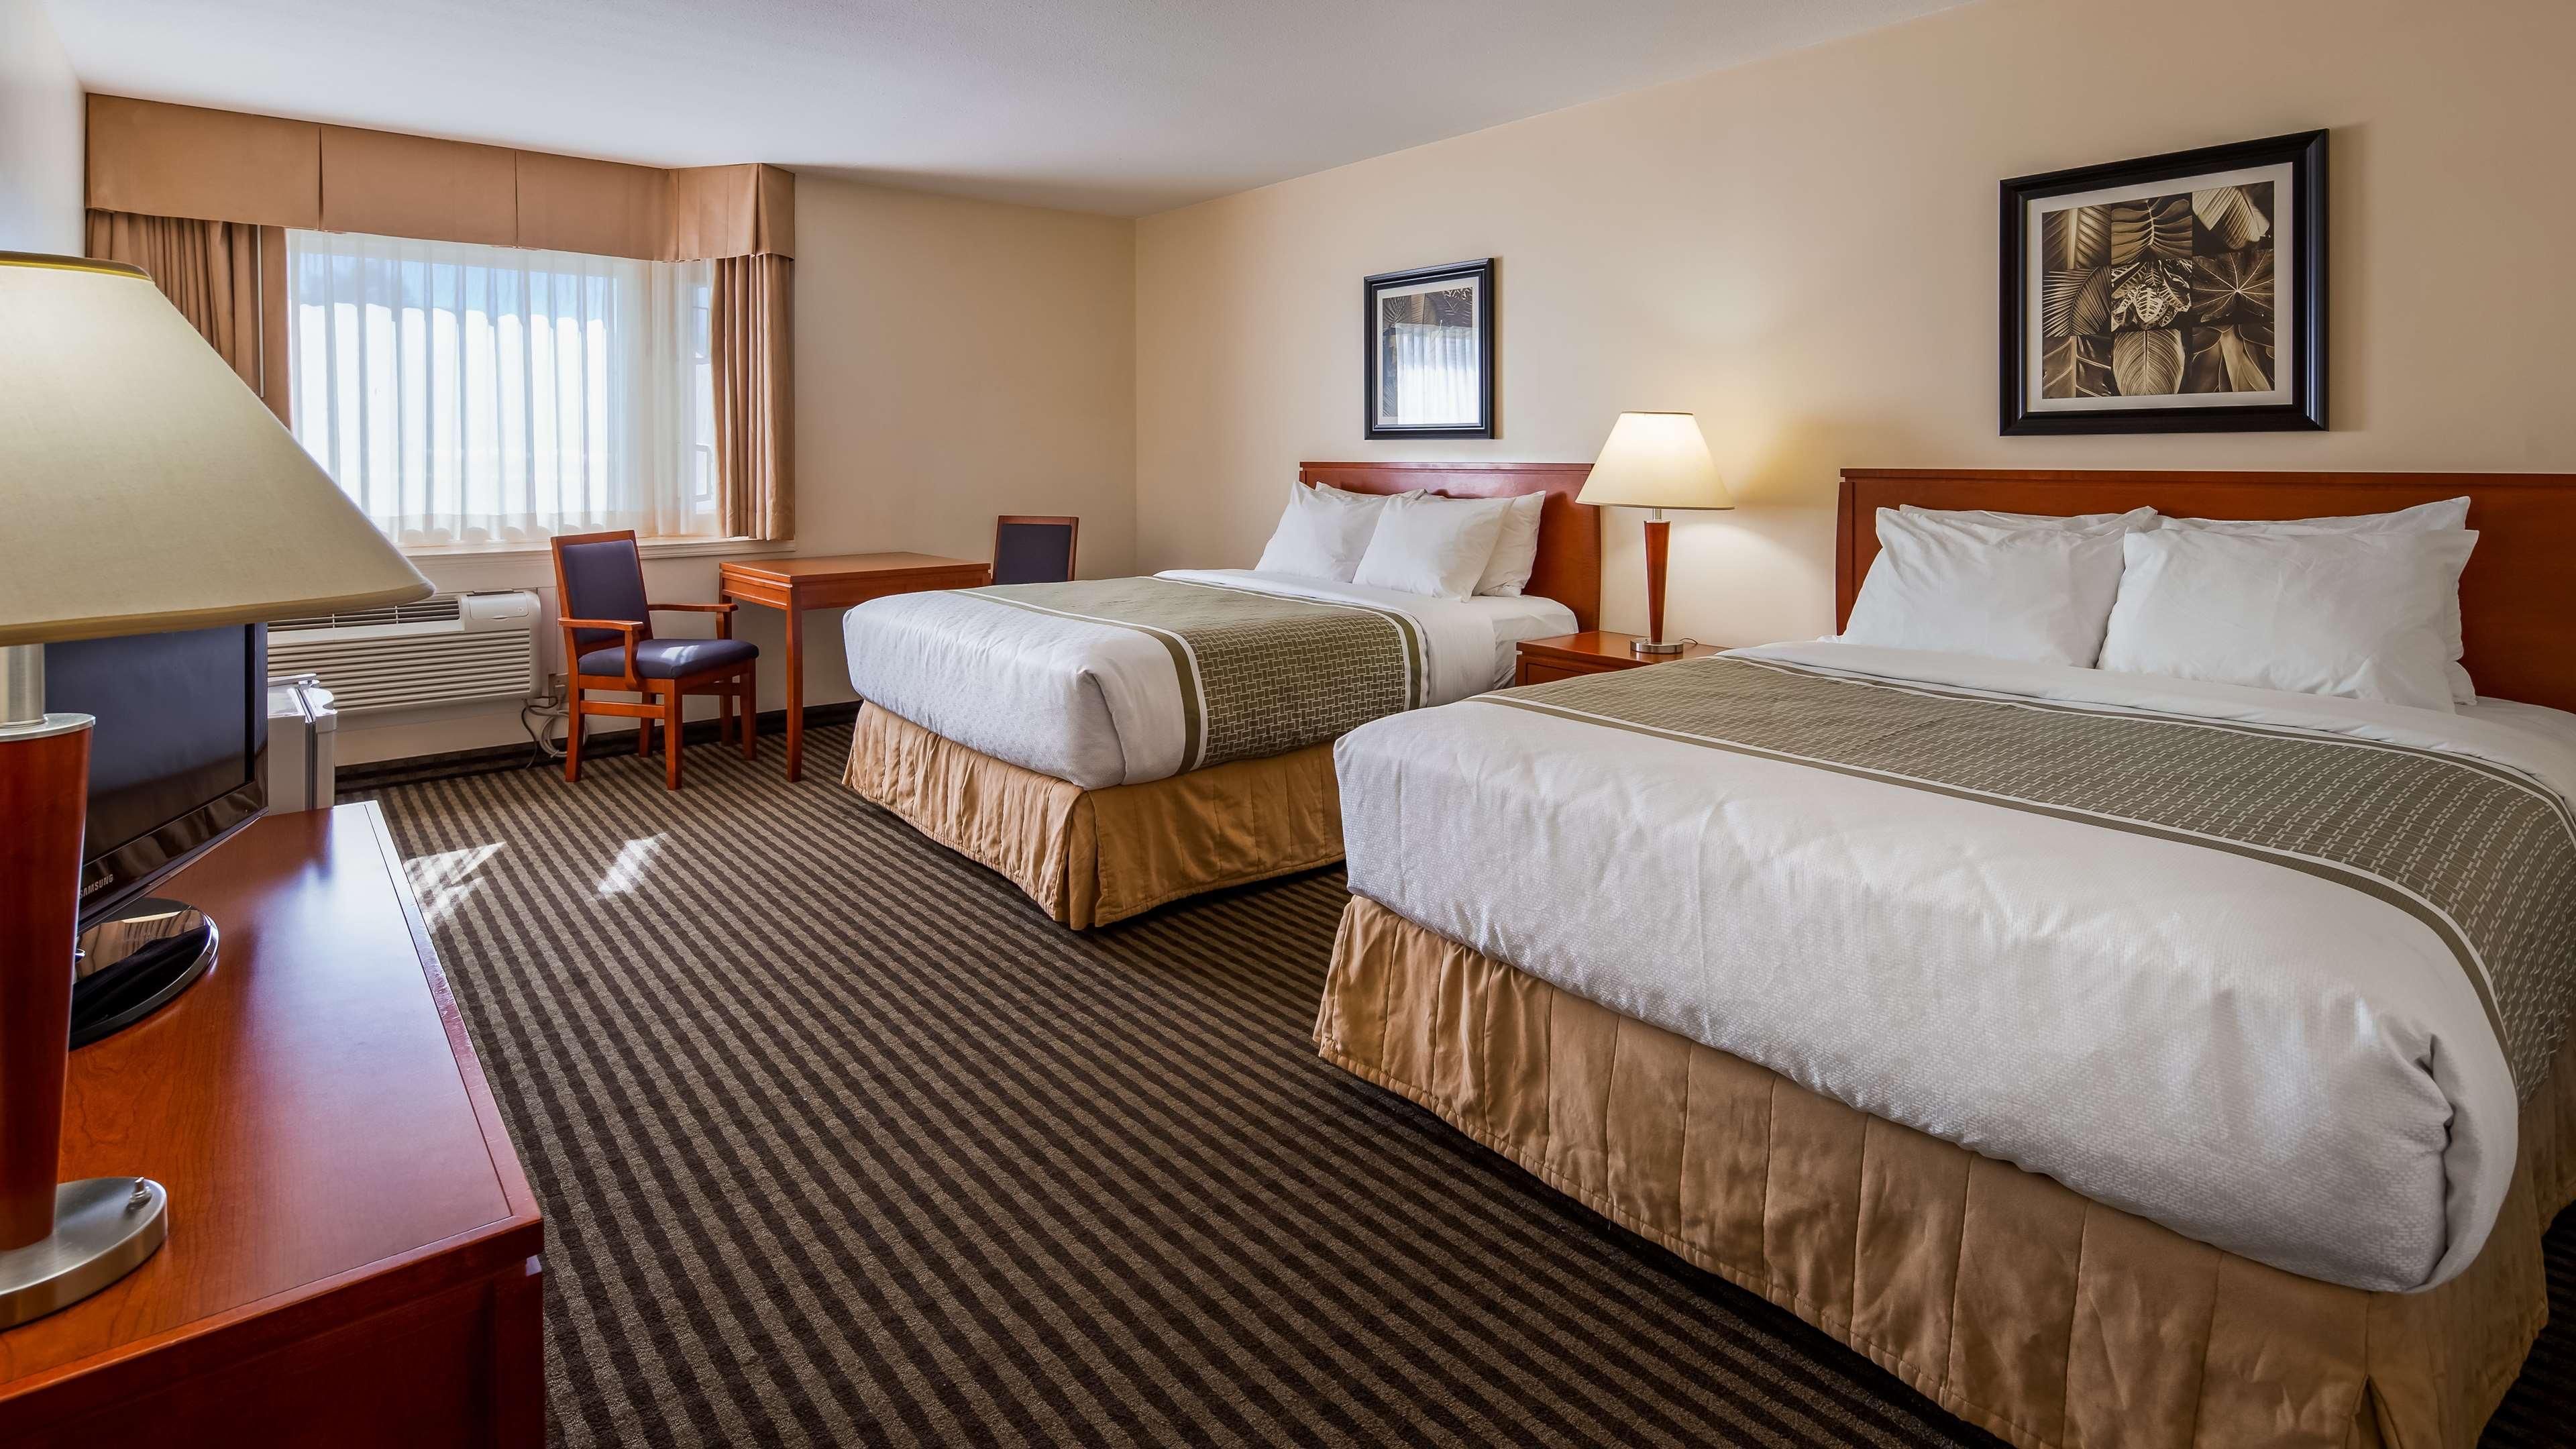 Surestay Hotel By Best Western Chilliwack in Chilliwack: Double Queen Guest Room